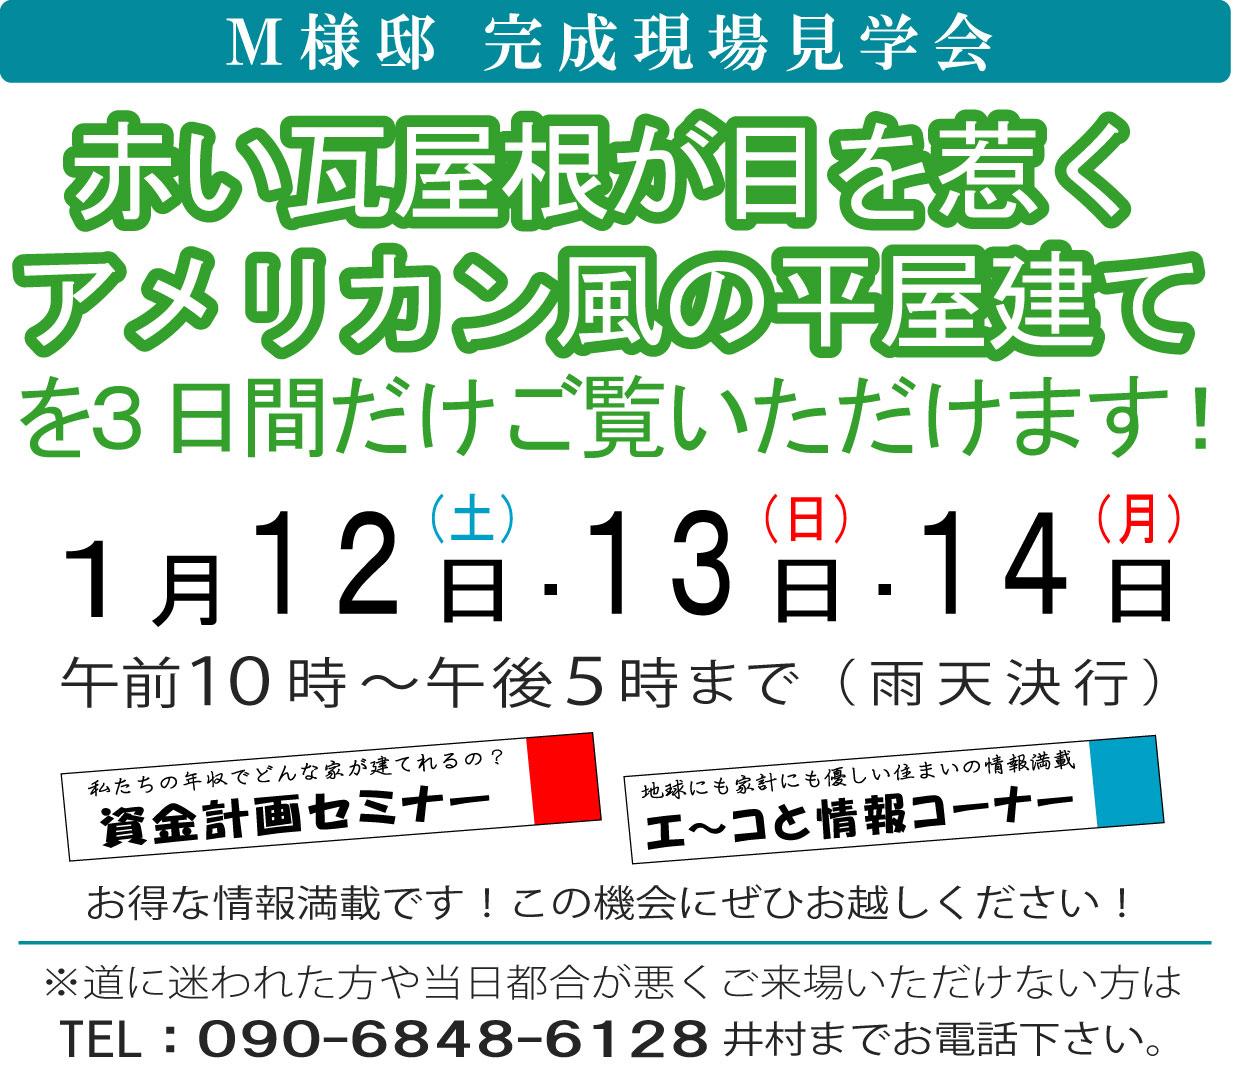 KuraSi-natu-sin67-04.jpg